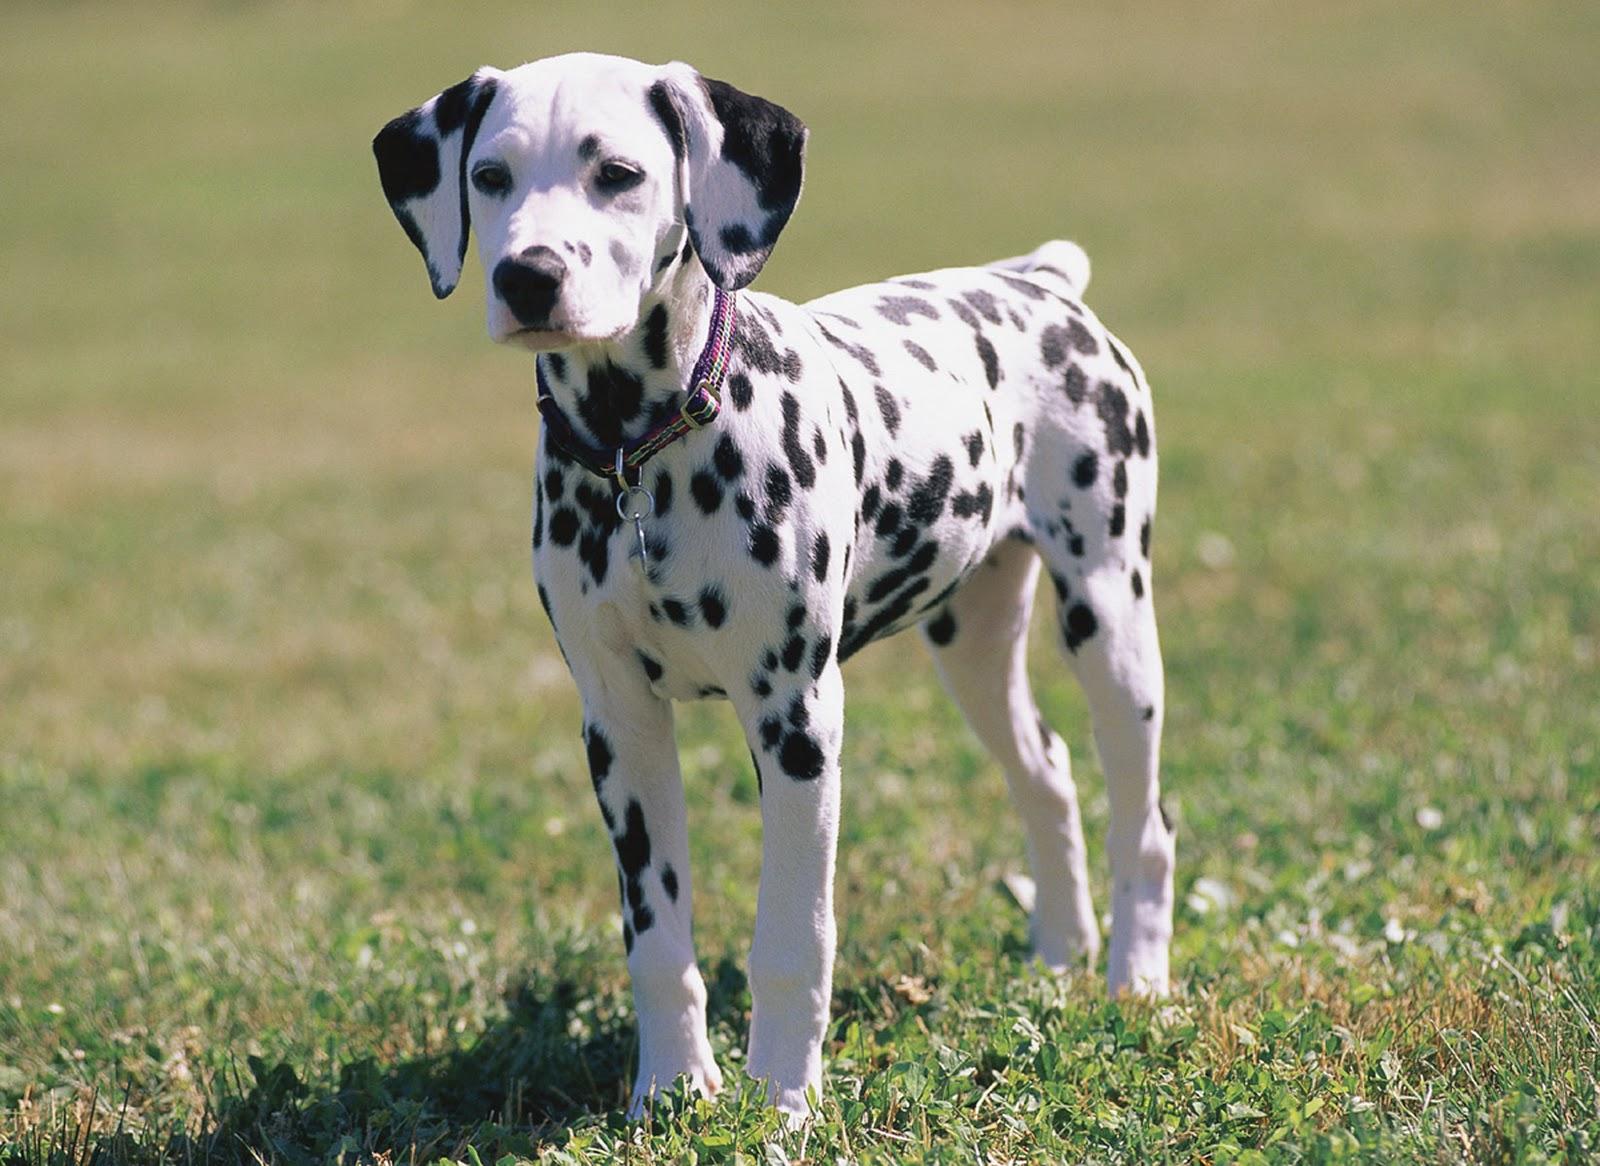 Puppy Dalmatian For Sale in New Mexico USA